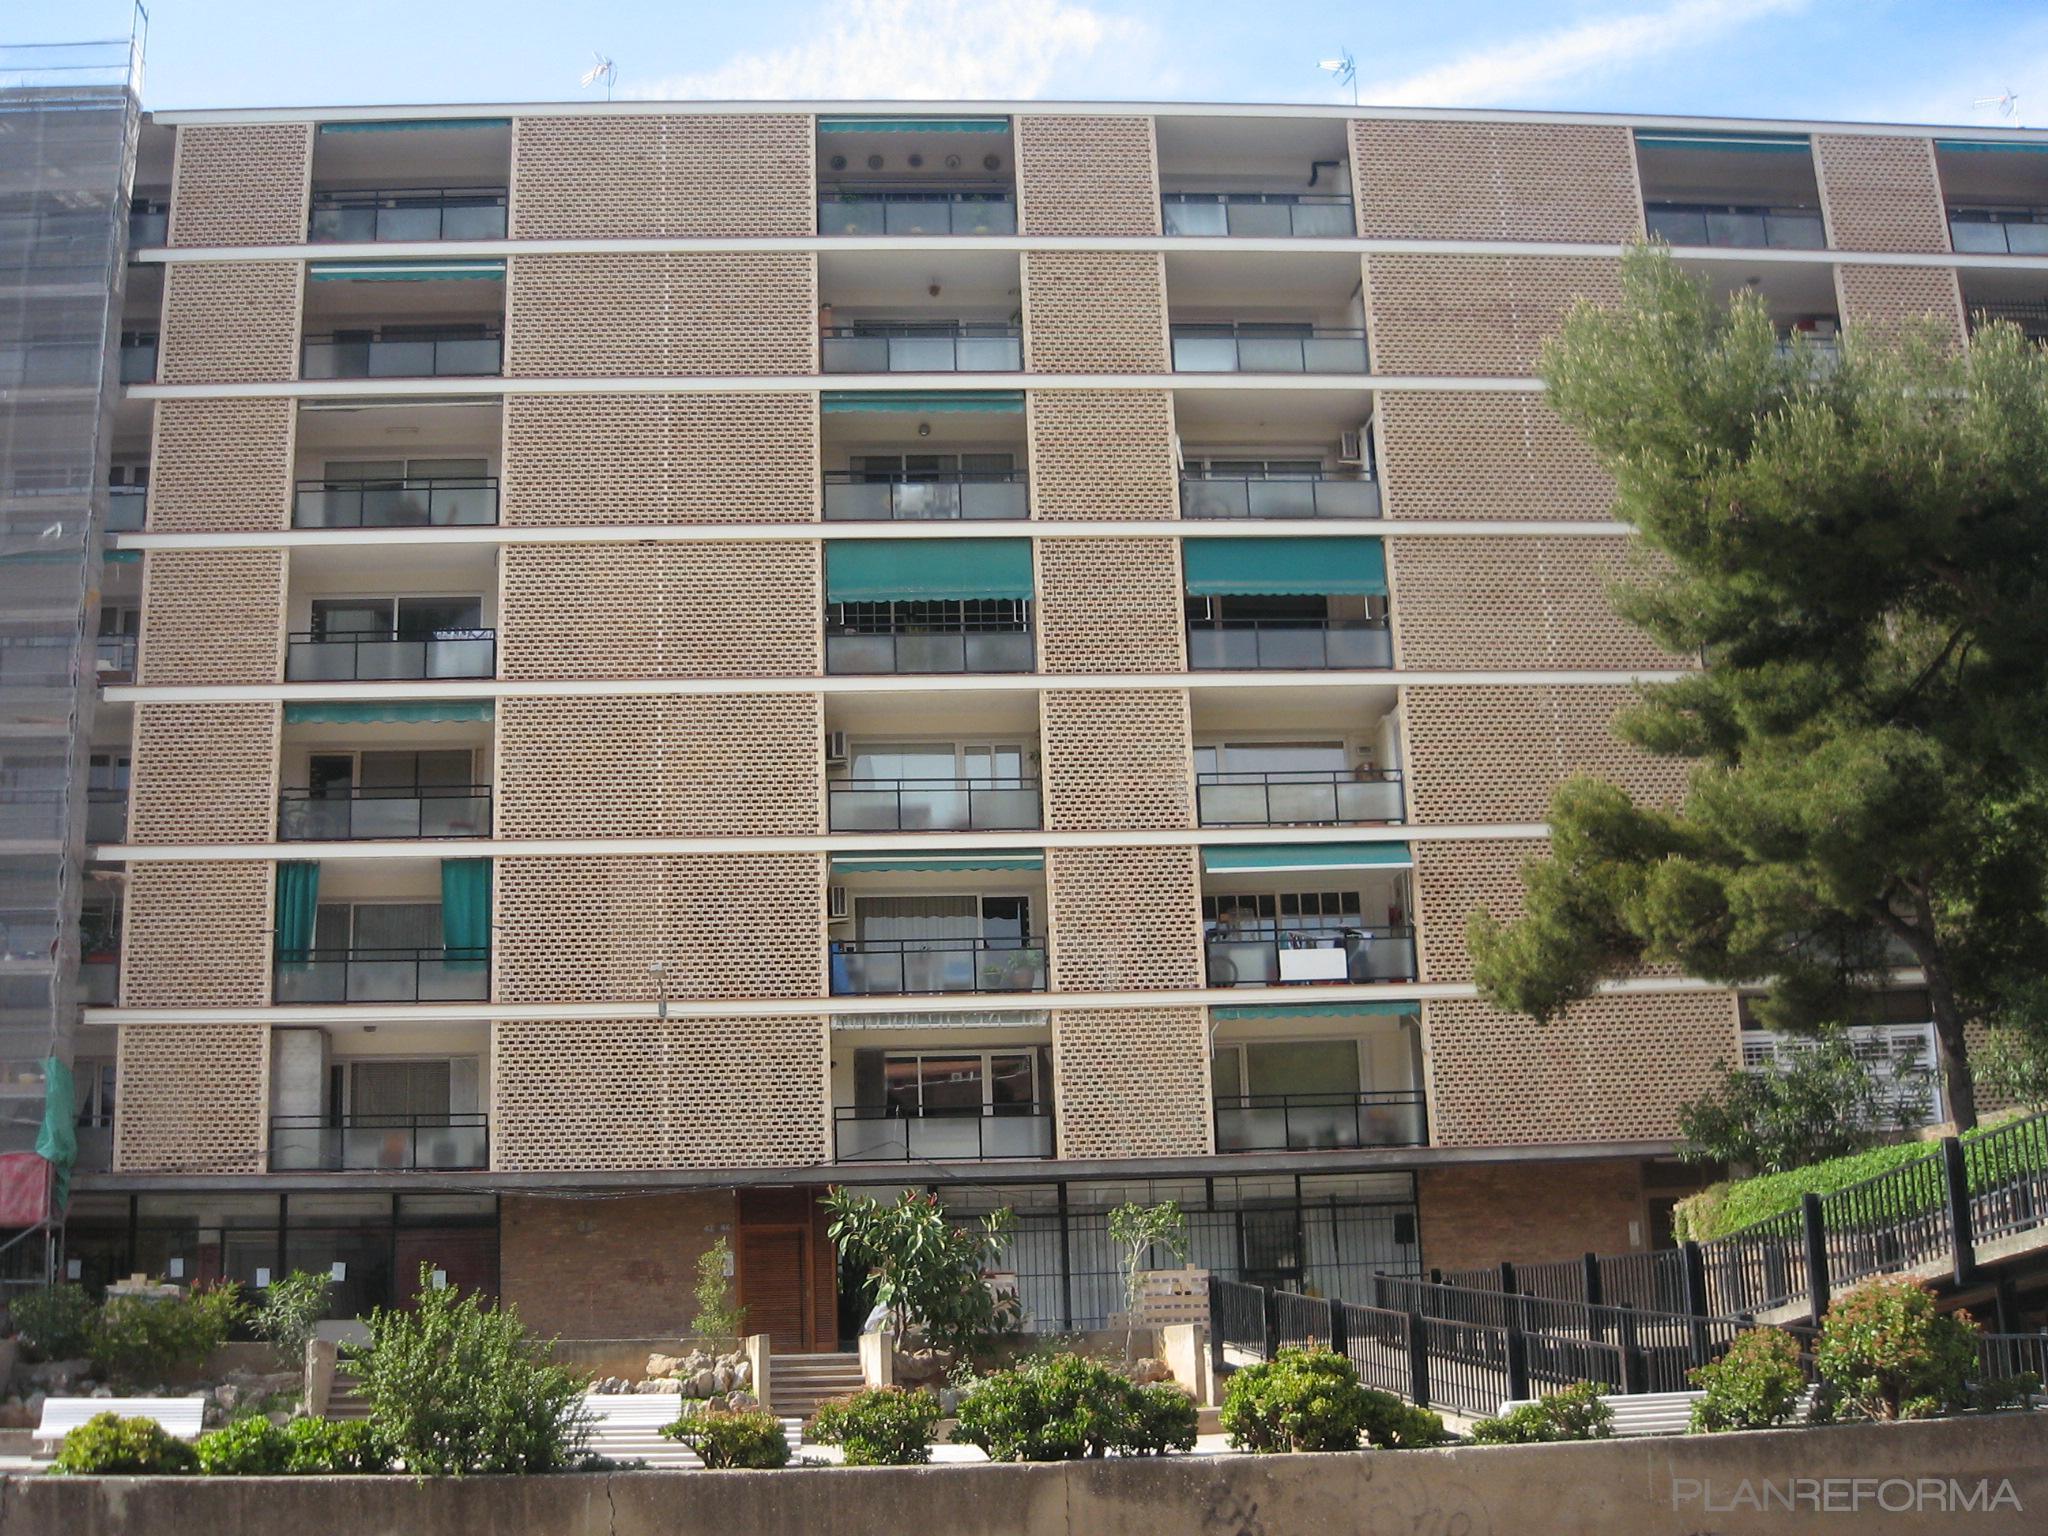 Recibidor balcon escalera exterior jardin style for Decoracion exterior jardin contemporaneo